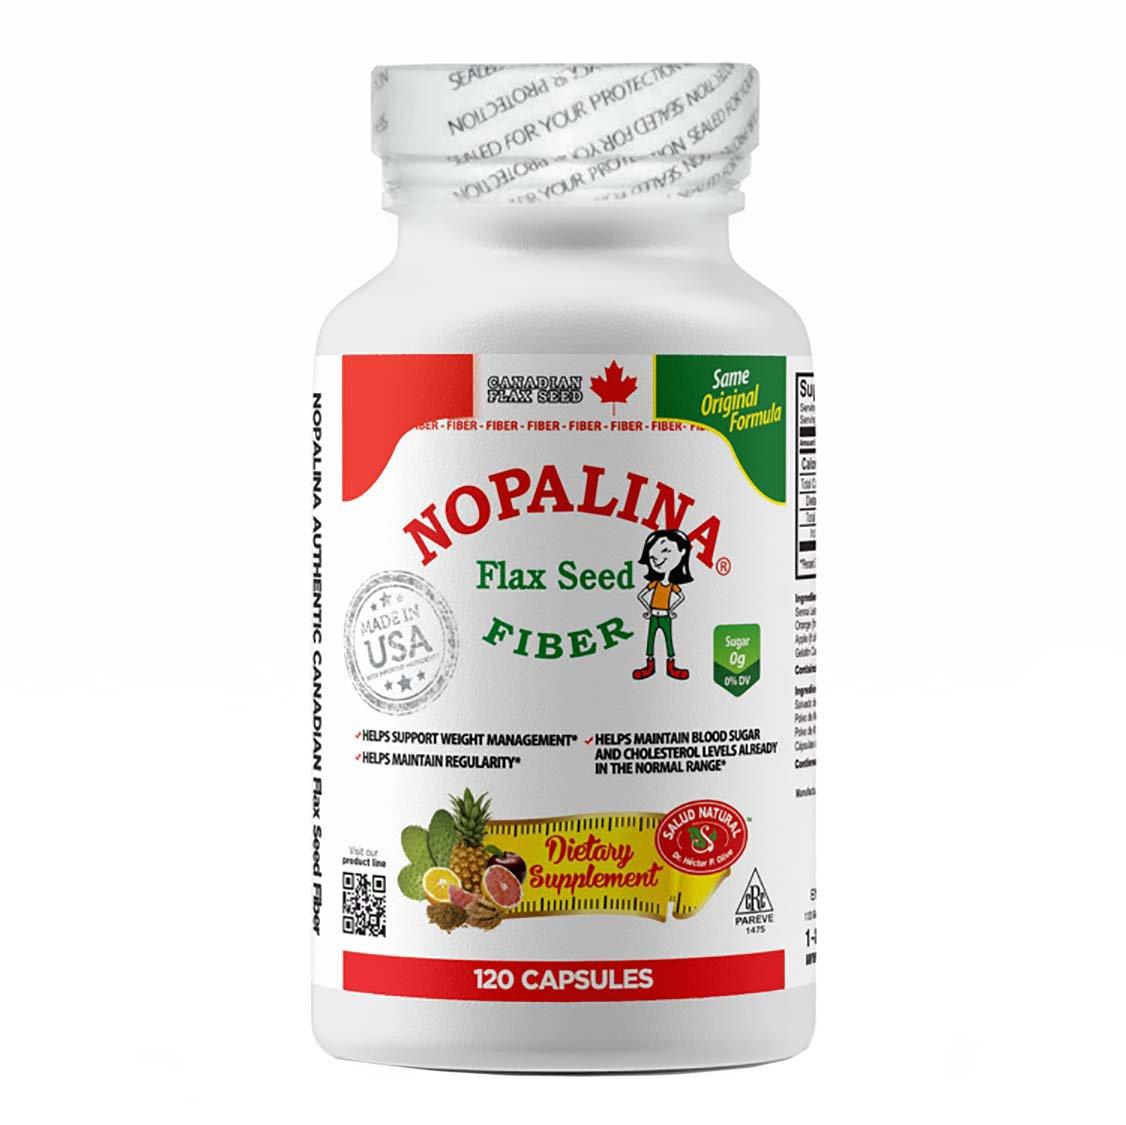 Nopalina pills